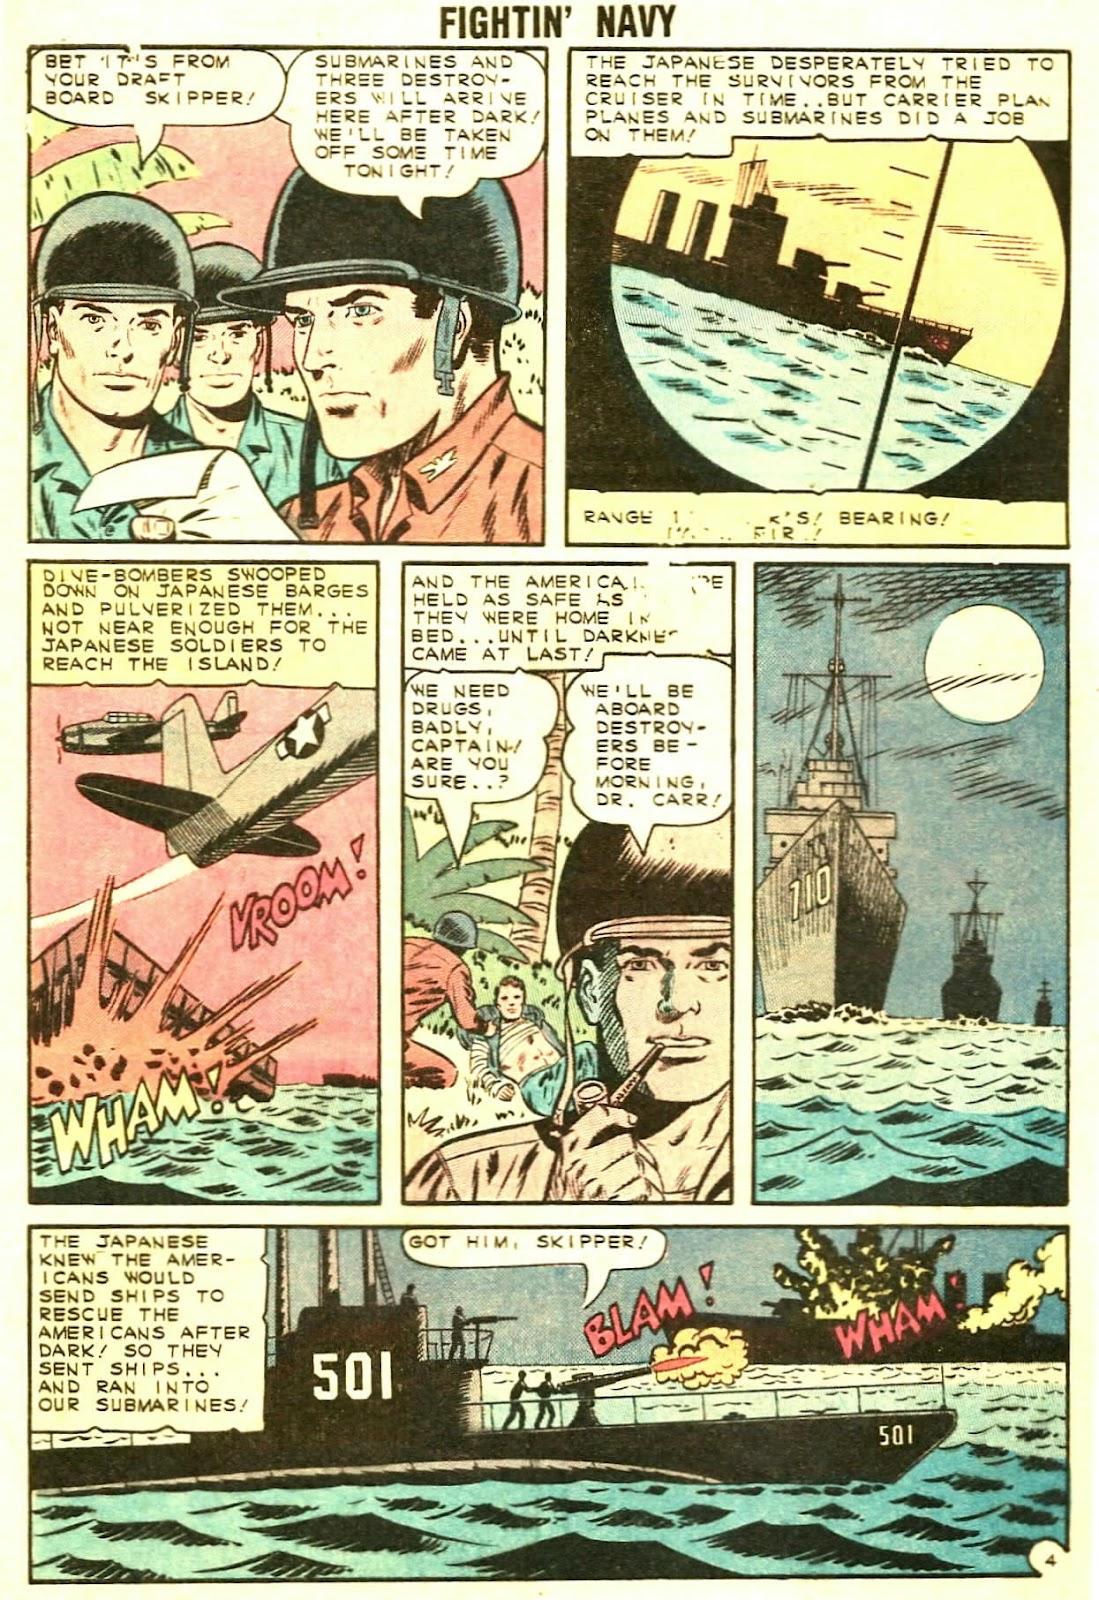 Read online Fightin' Navy comic -  Issue #119 - 28